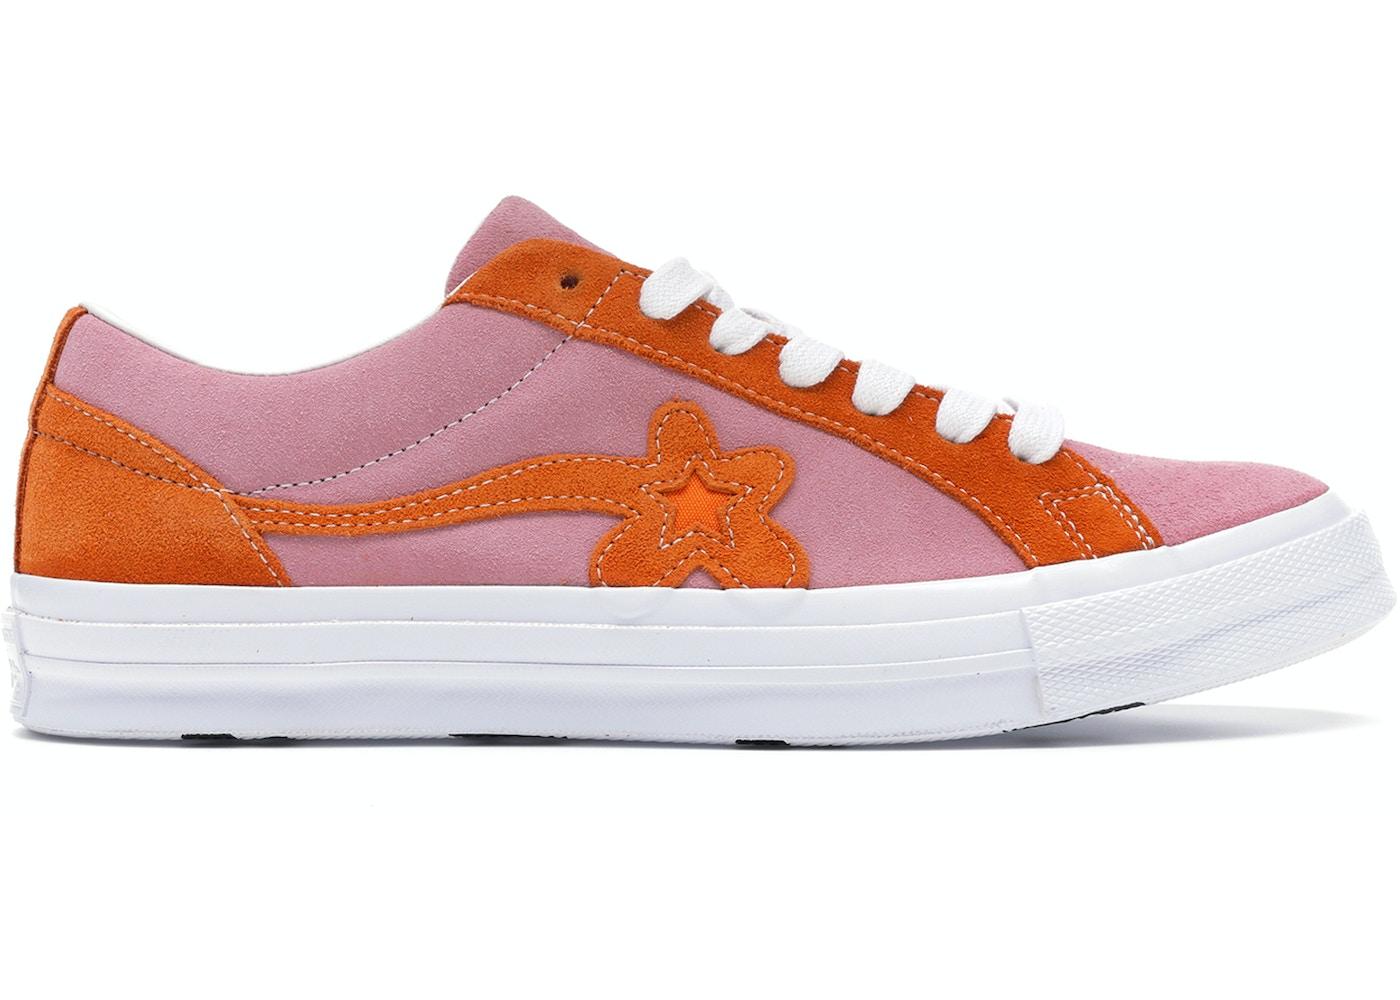 Converse One Star Ox Tyler The Creator Golf Le Fleur Pink Orange 162125c